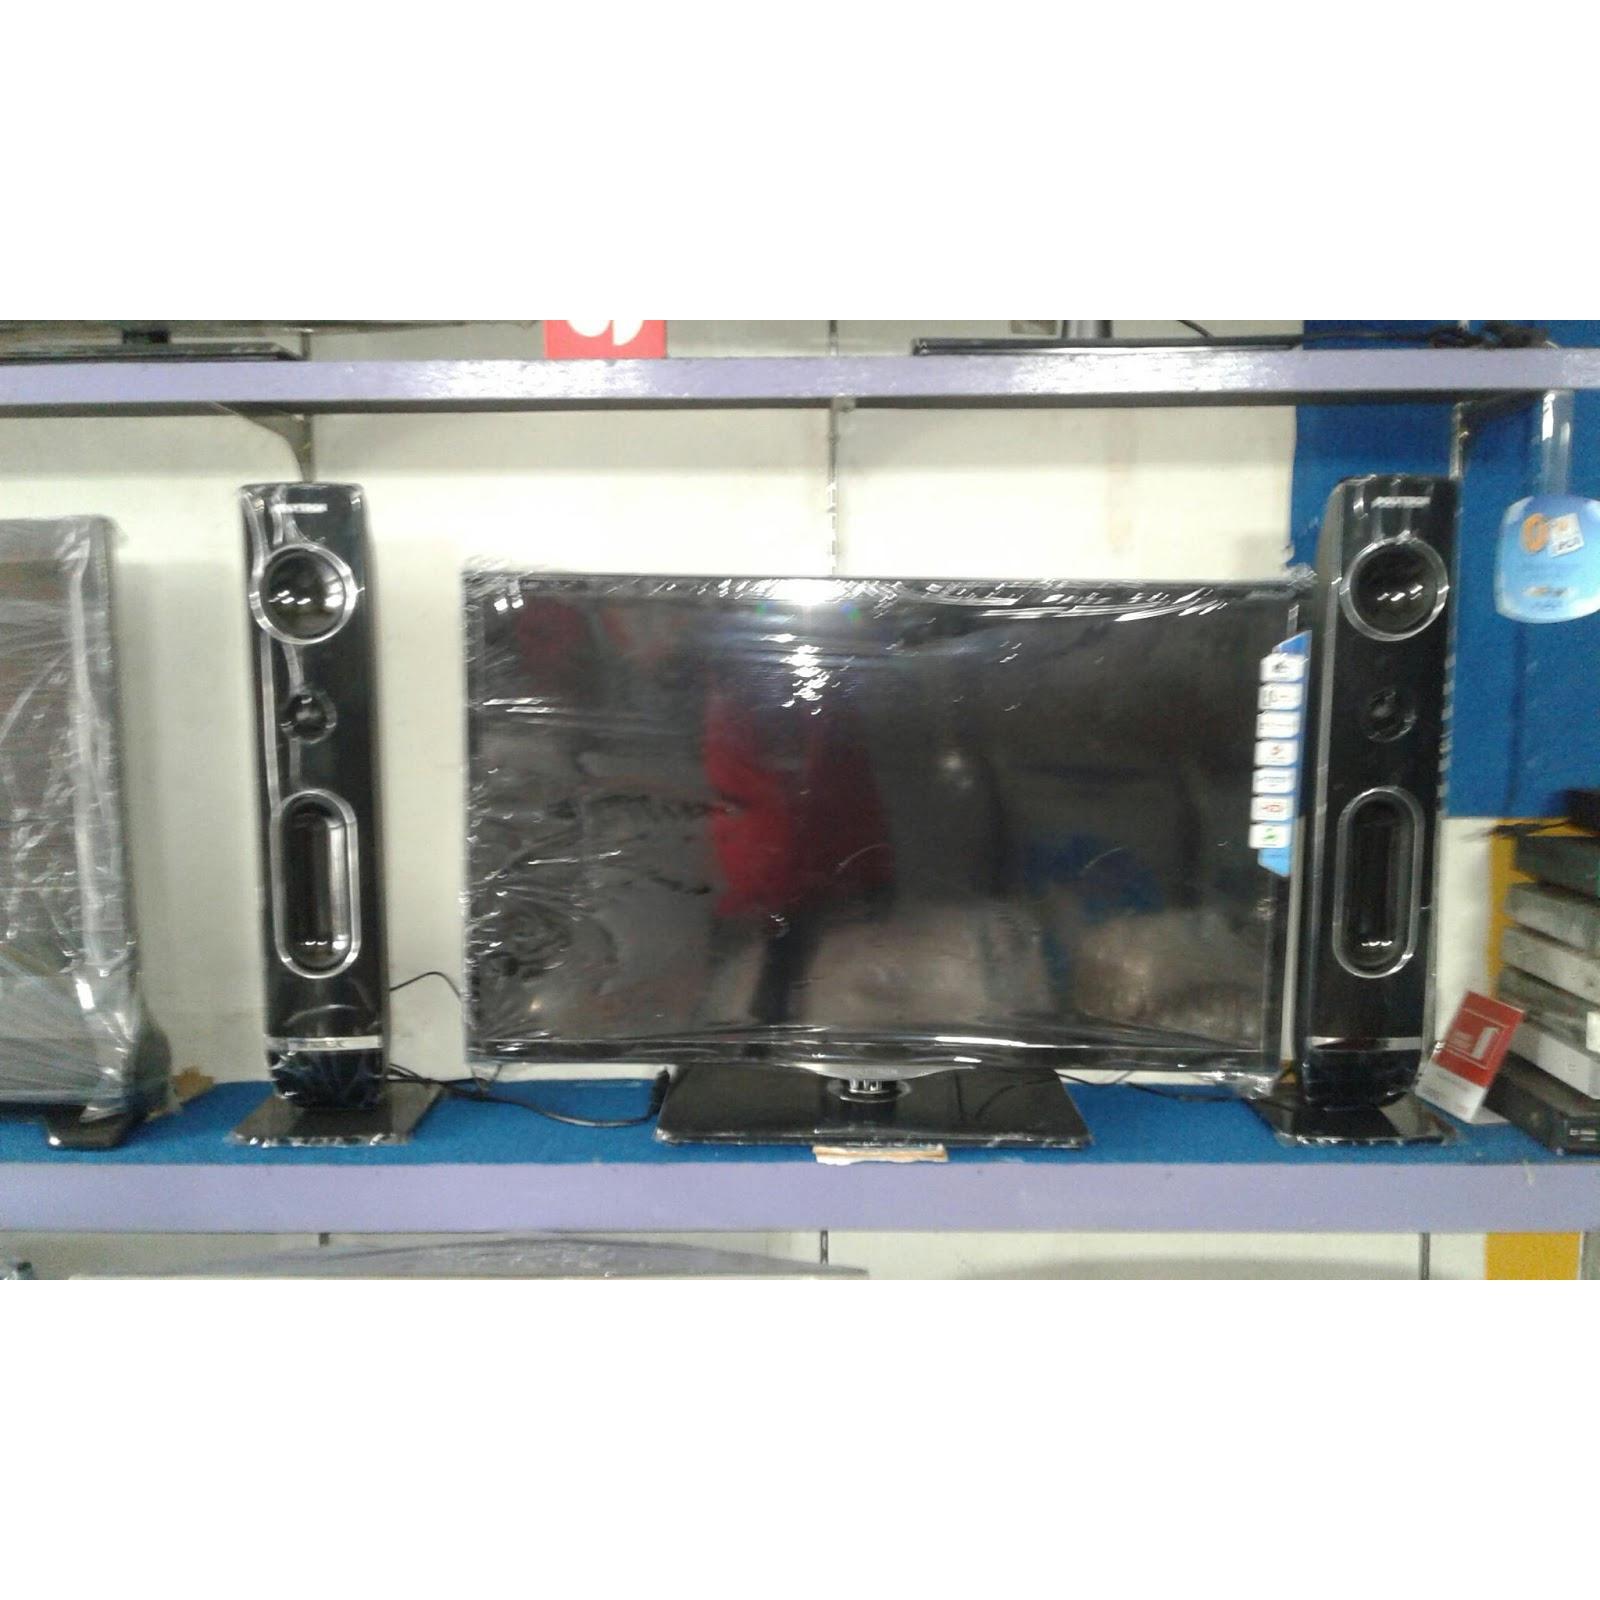 Polytron 32D106 LED TV [32 Inch]